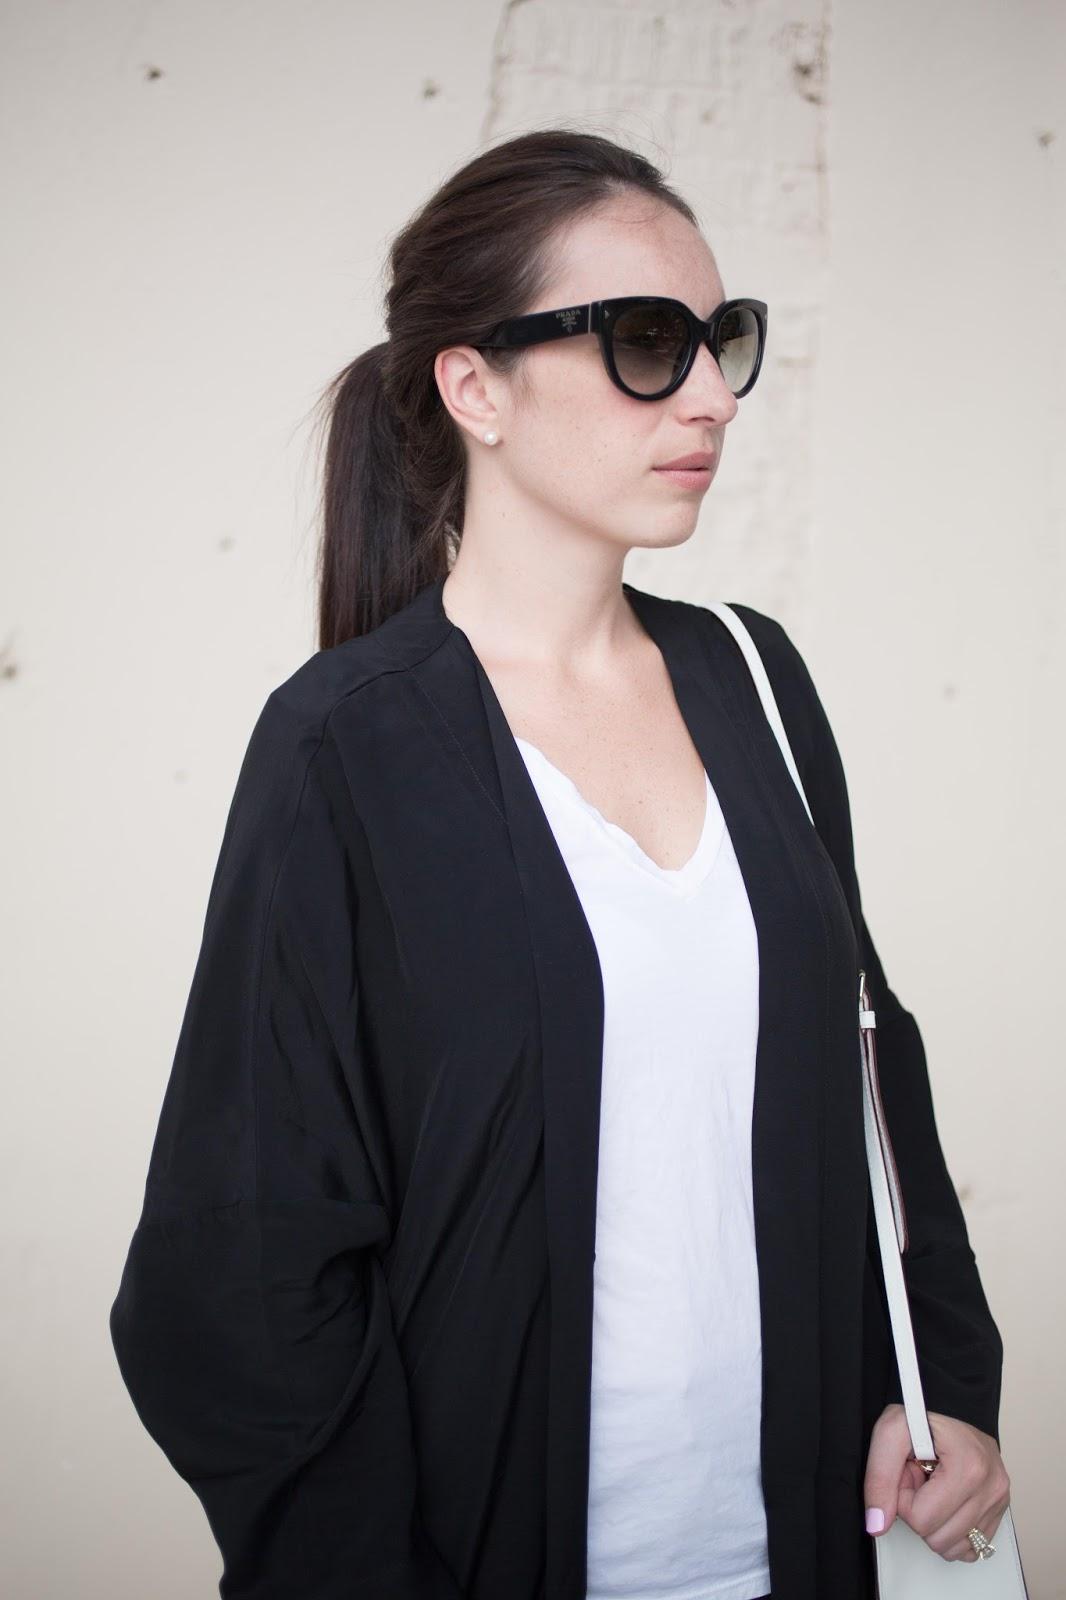 duster coat prada cateye sunglasses duster coat womenswear style fashion